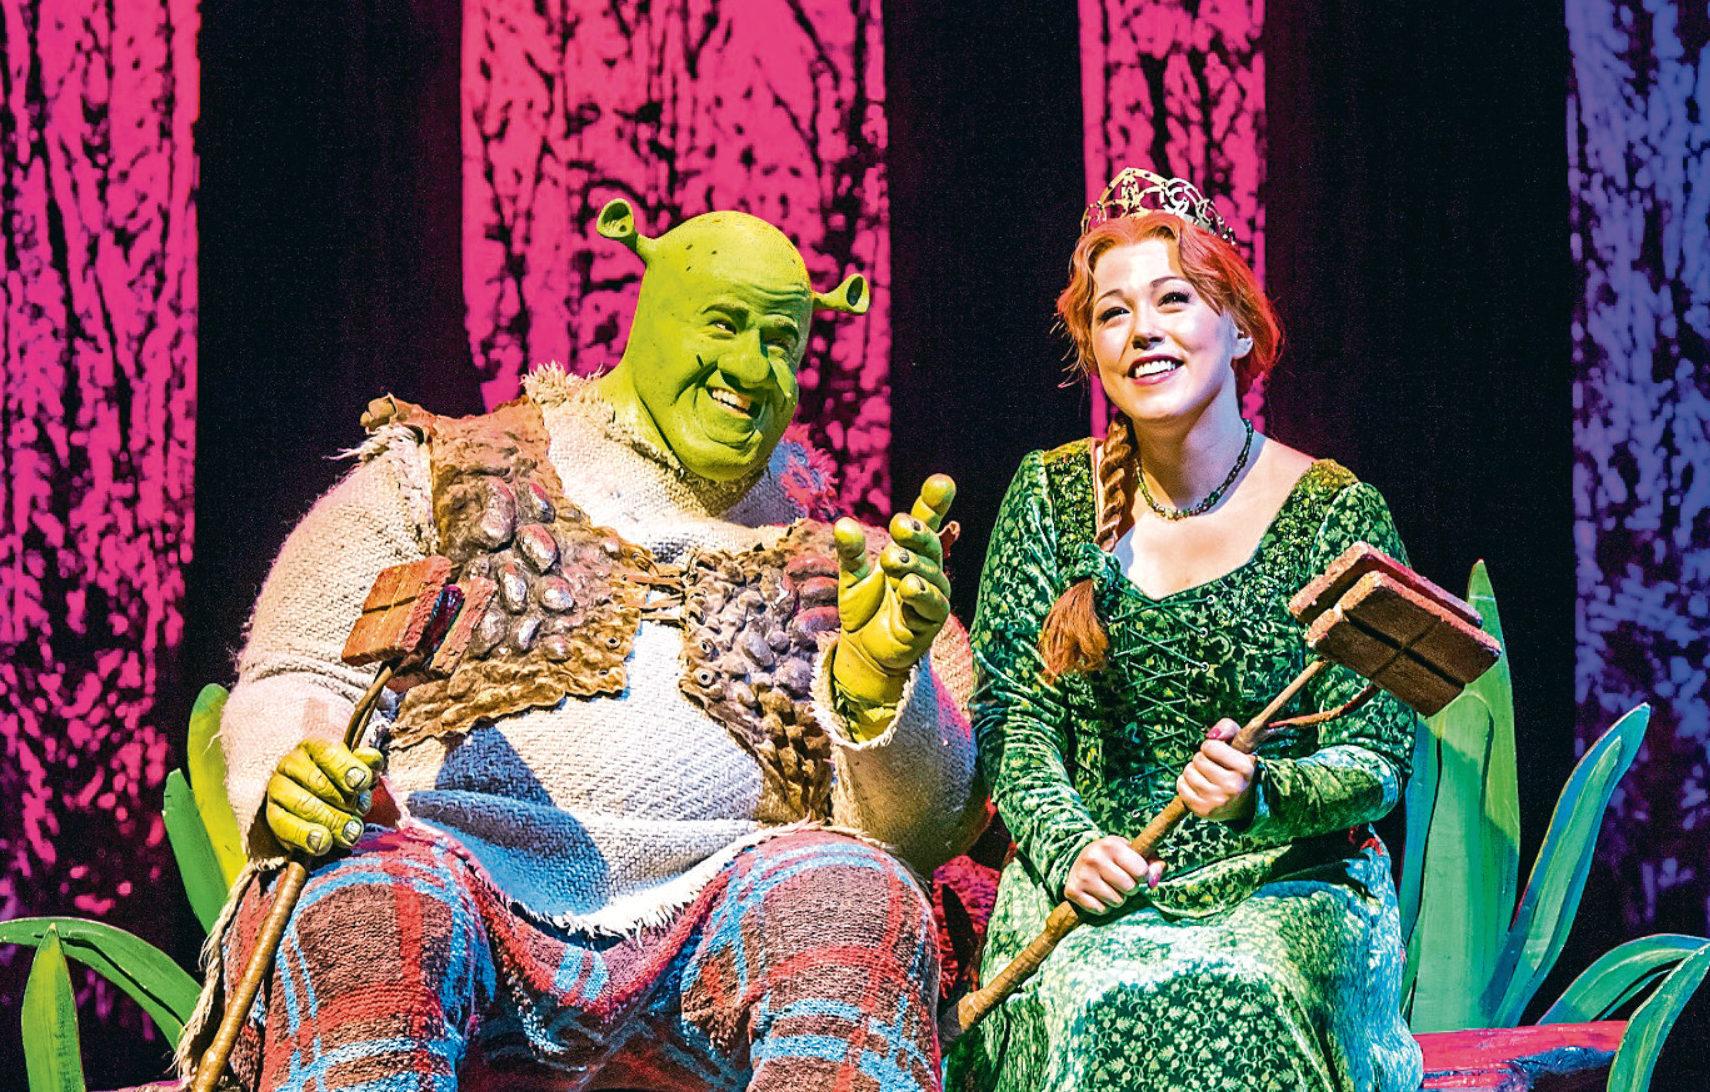 A scene from Shrek The Musical, featuring Amelia Lily as Princess Fiona (Tristram Kenton)